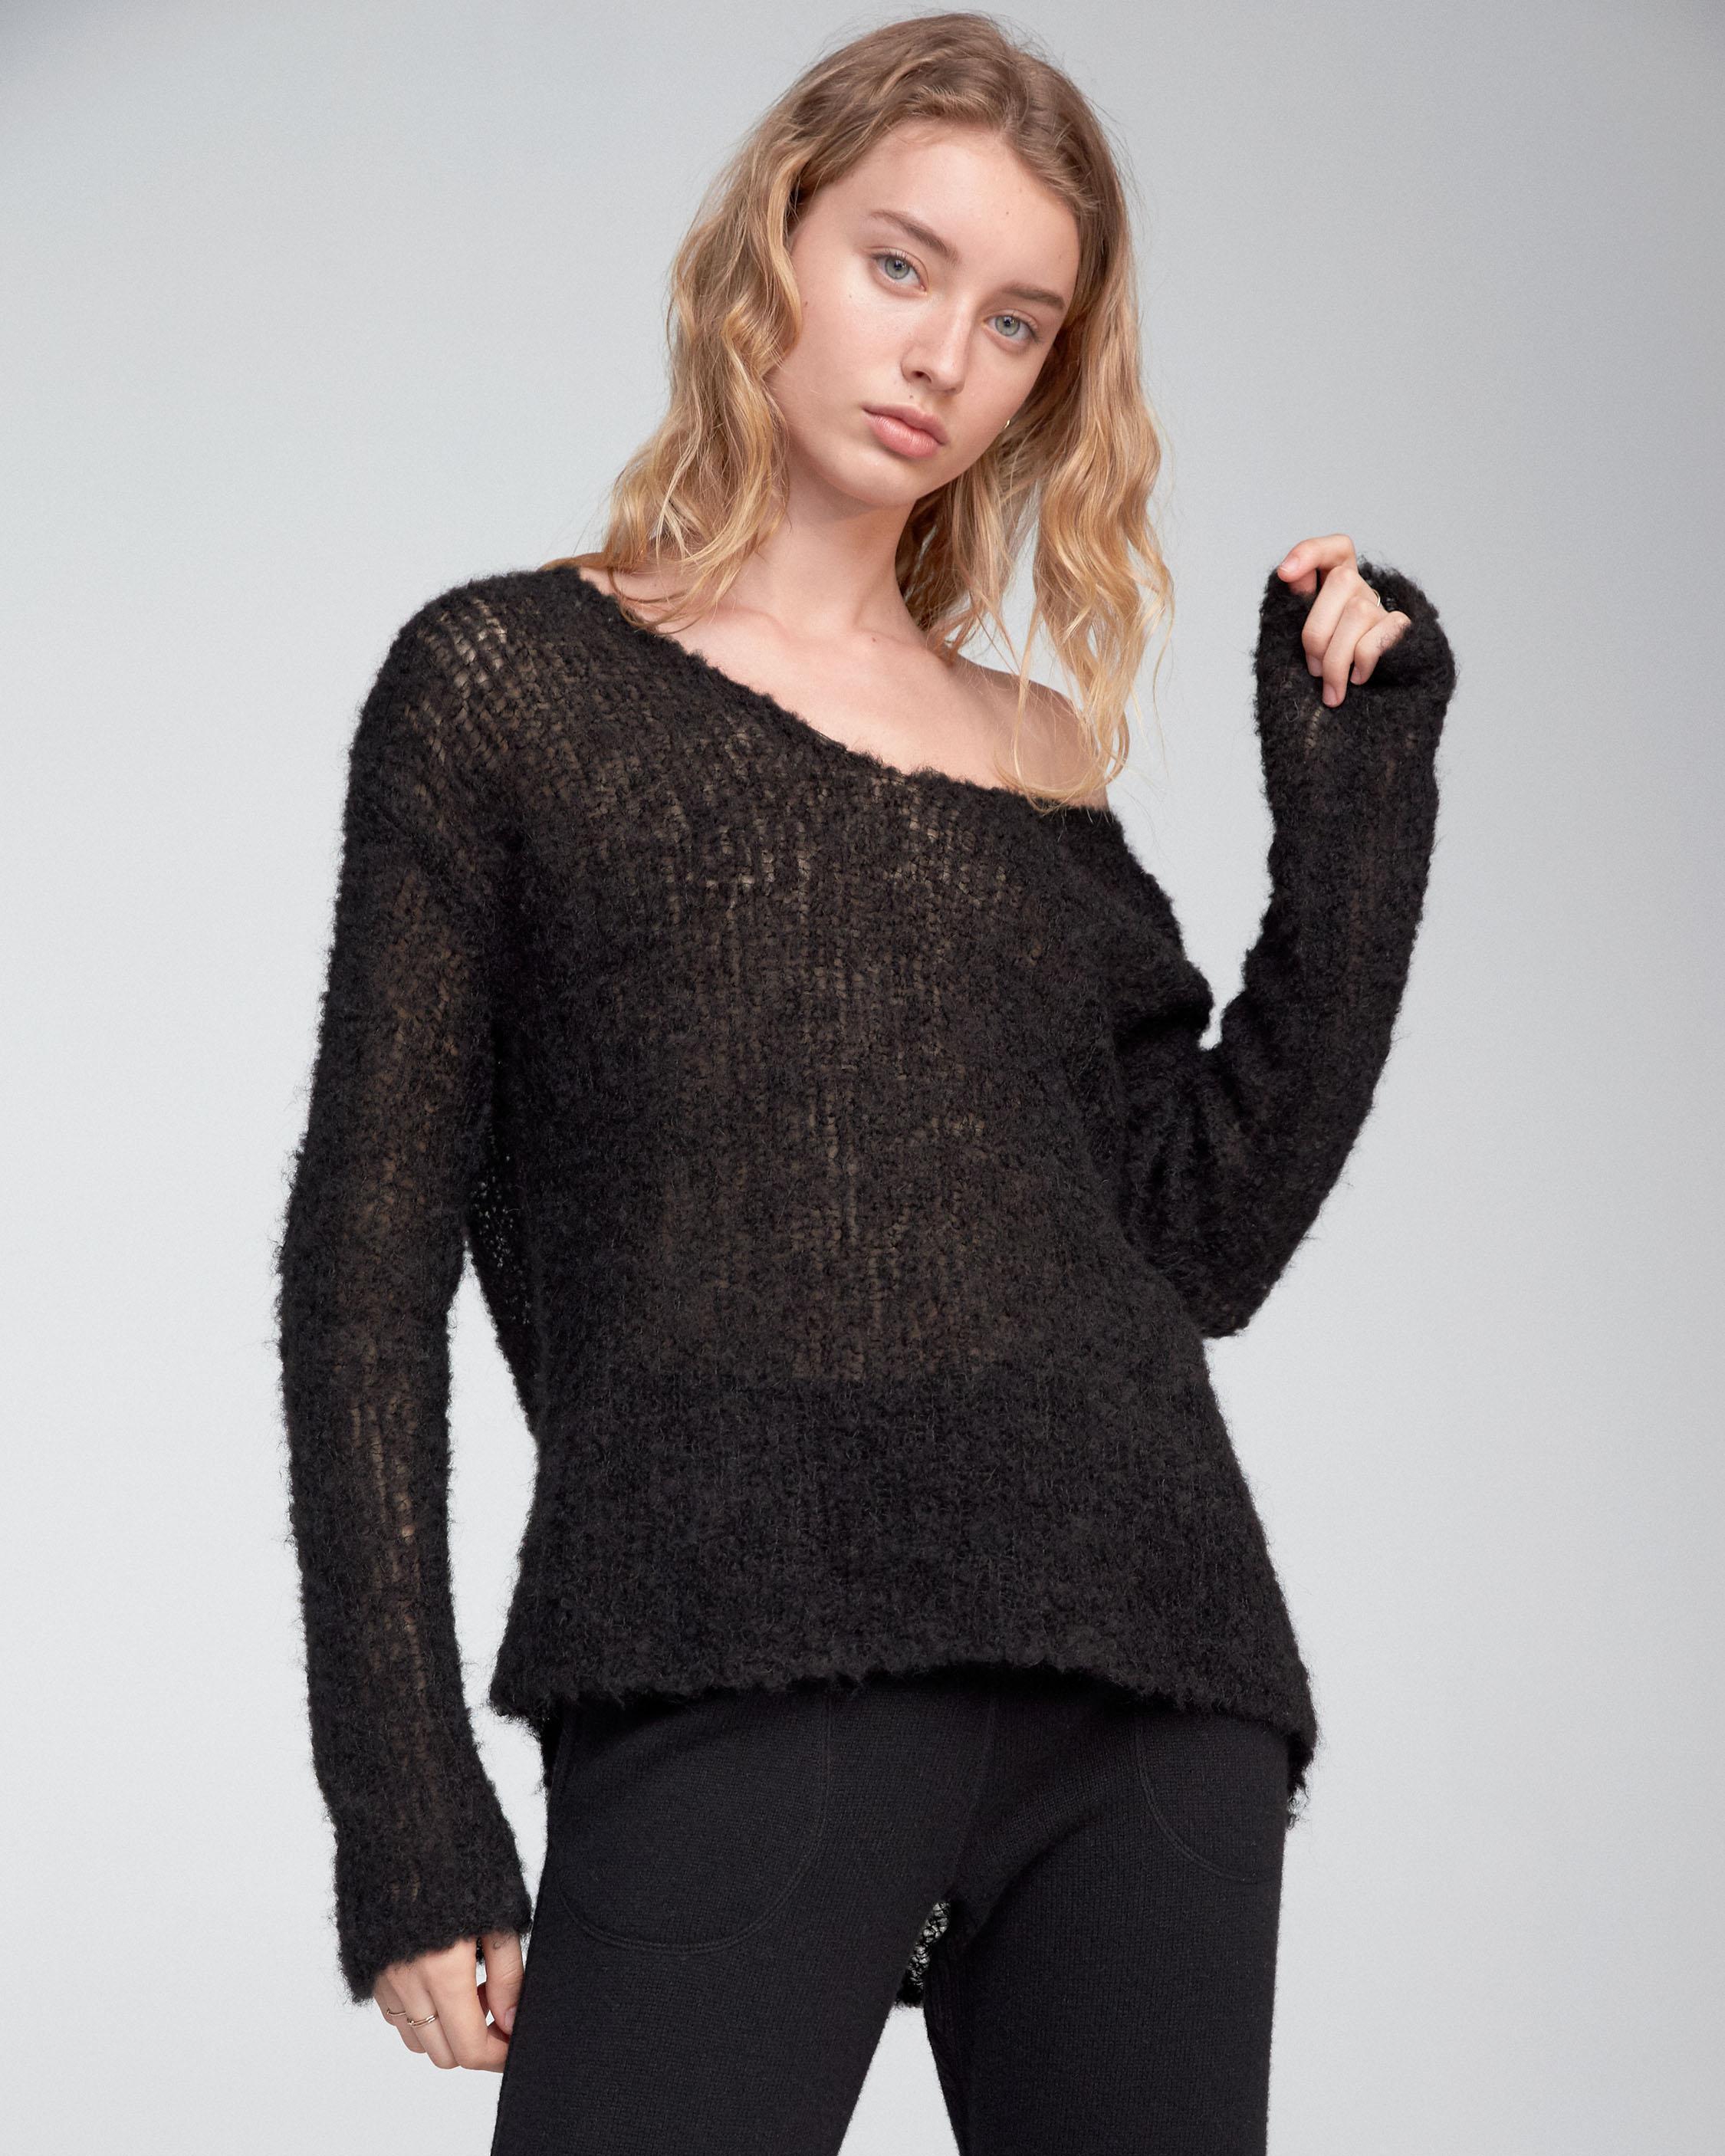 Sweaters, Sweatshirts & Cardigans in Cashmere, Wool & Knit| rag & bone